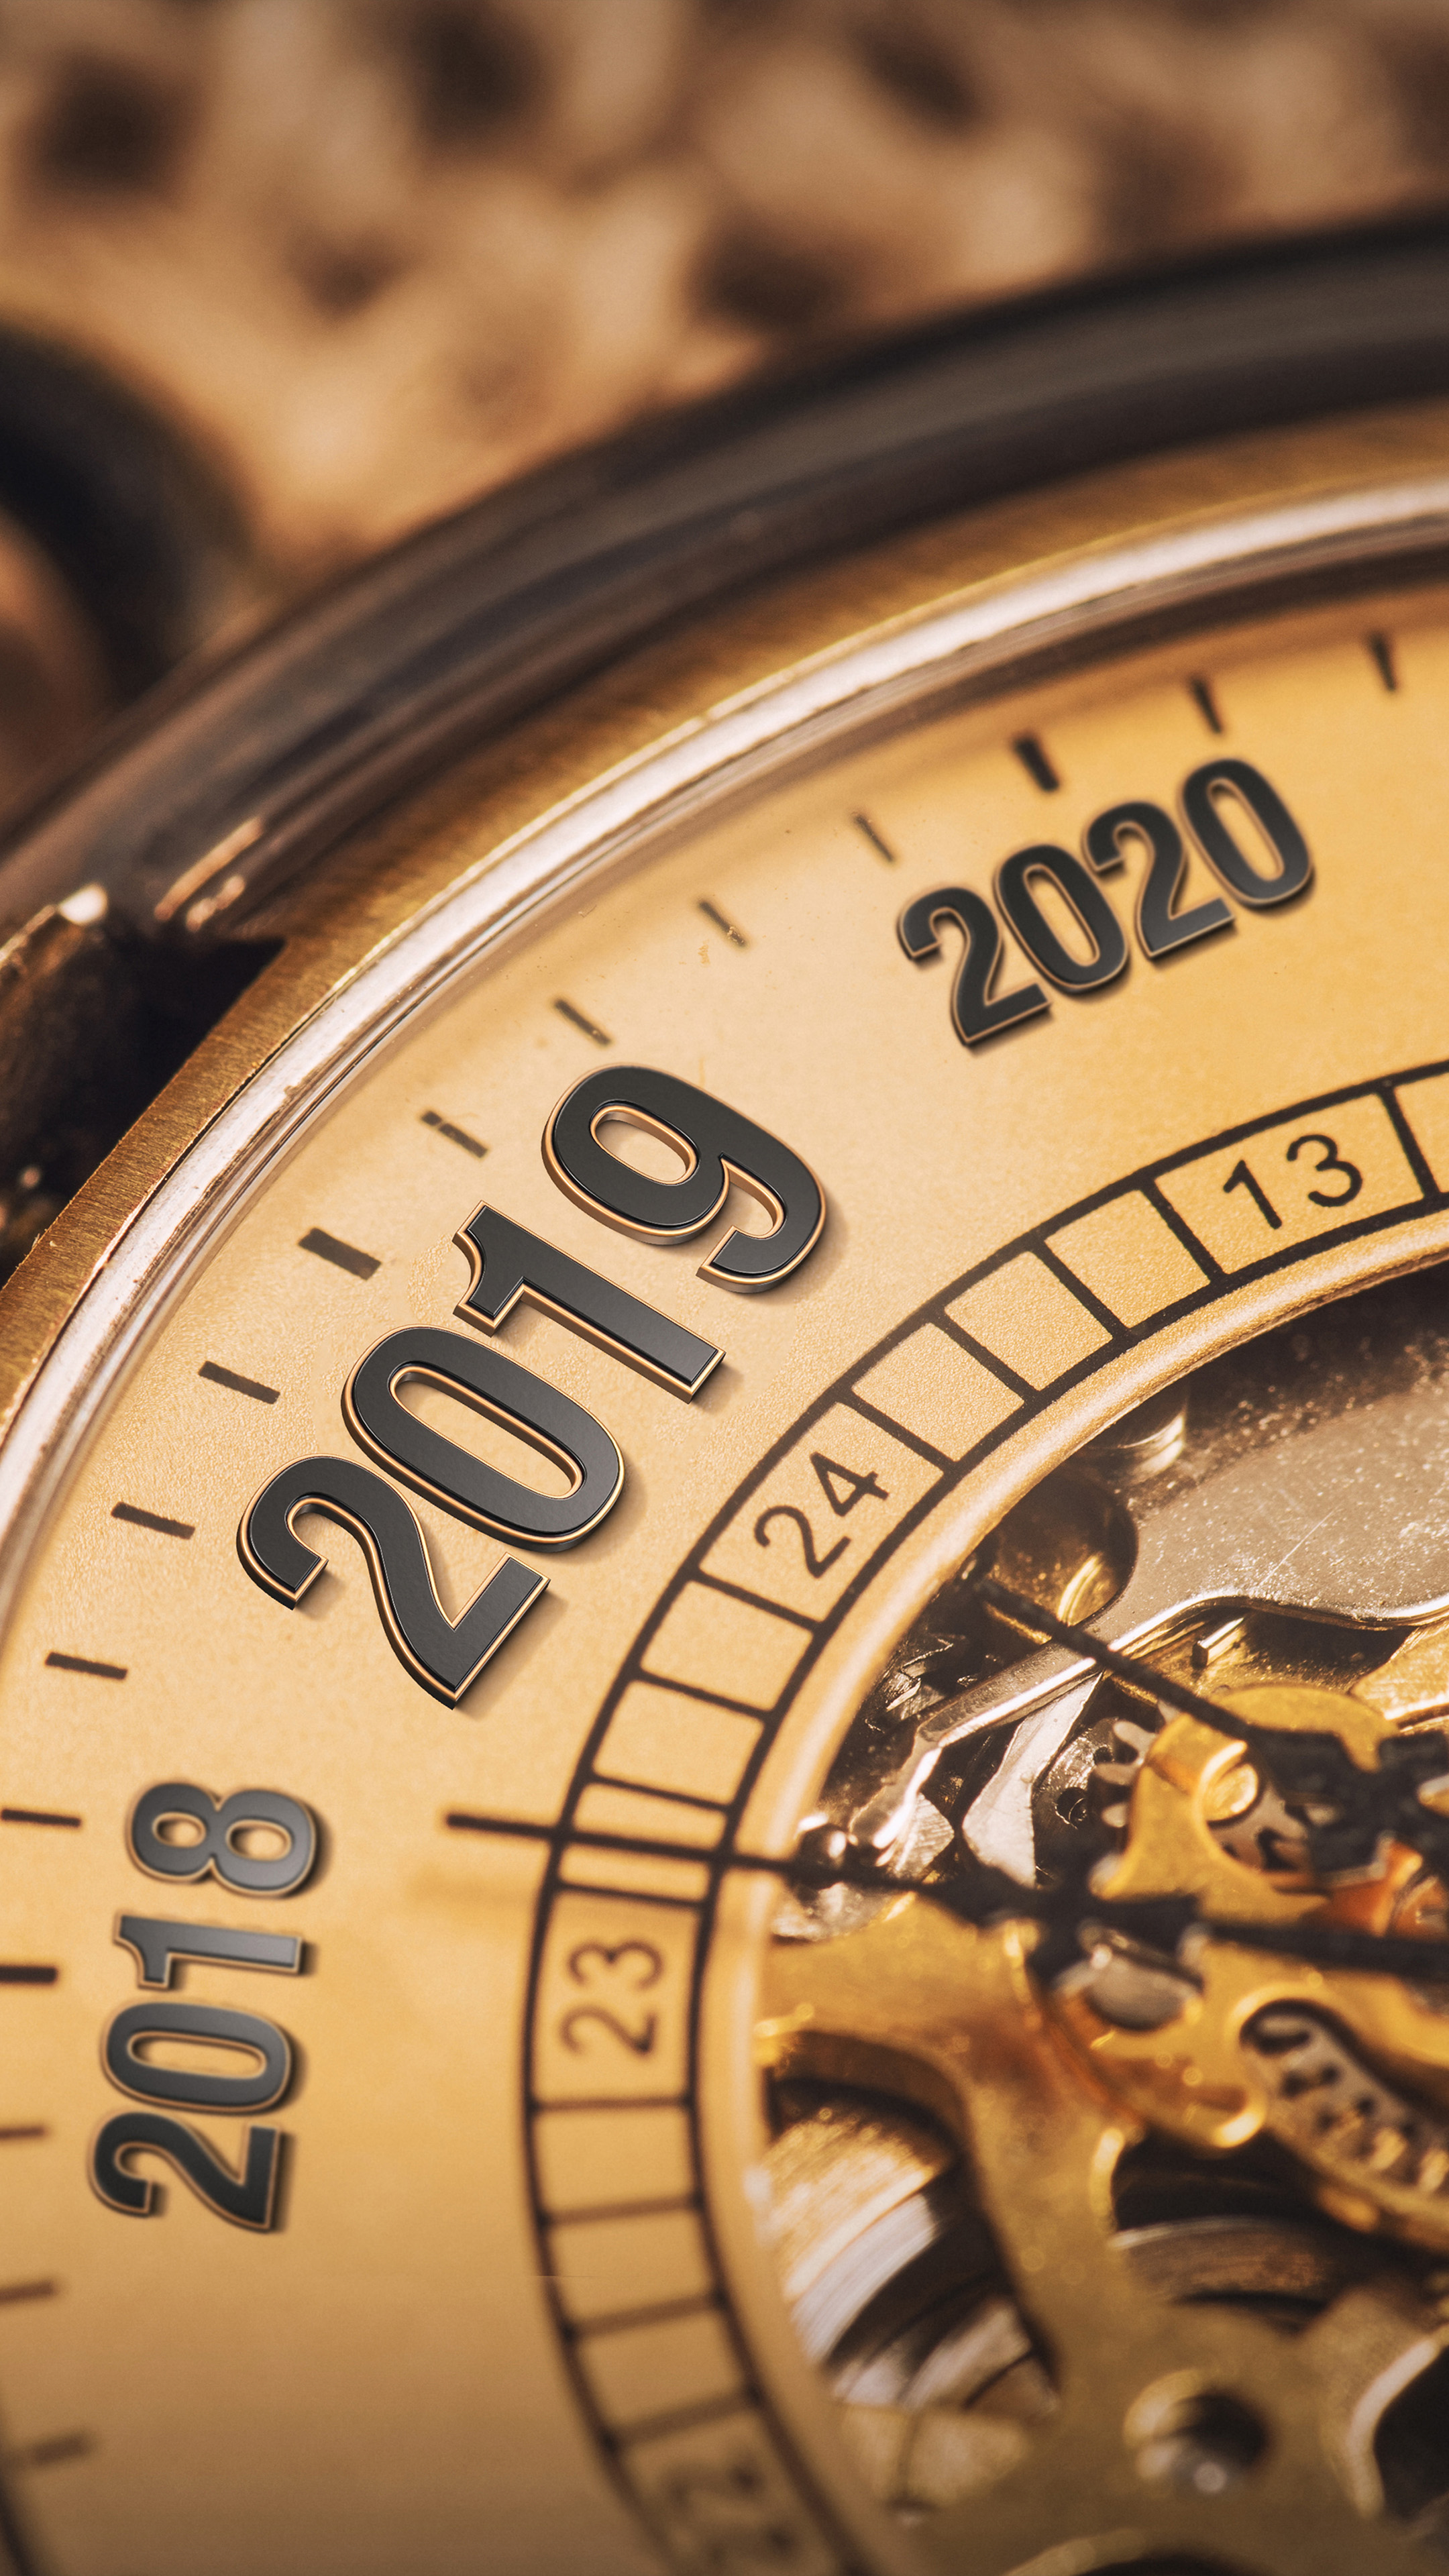 New Year 2019 Clock 4k Ultra Hd Mobile Wallpaper   New Year 2019 2160x3840